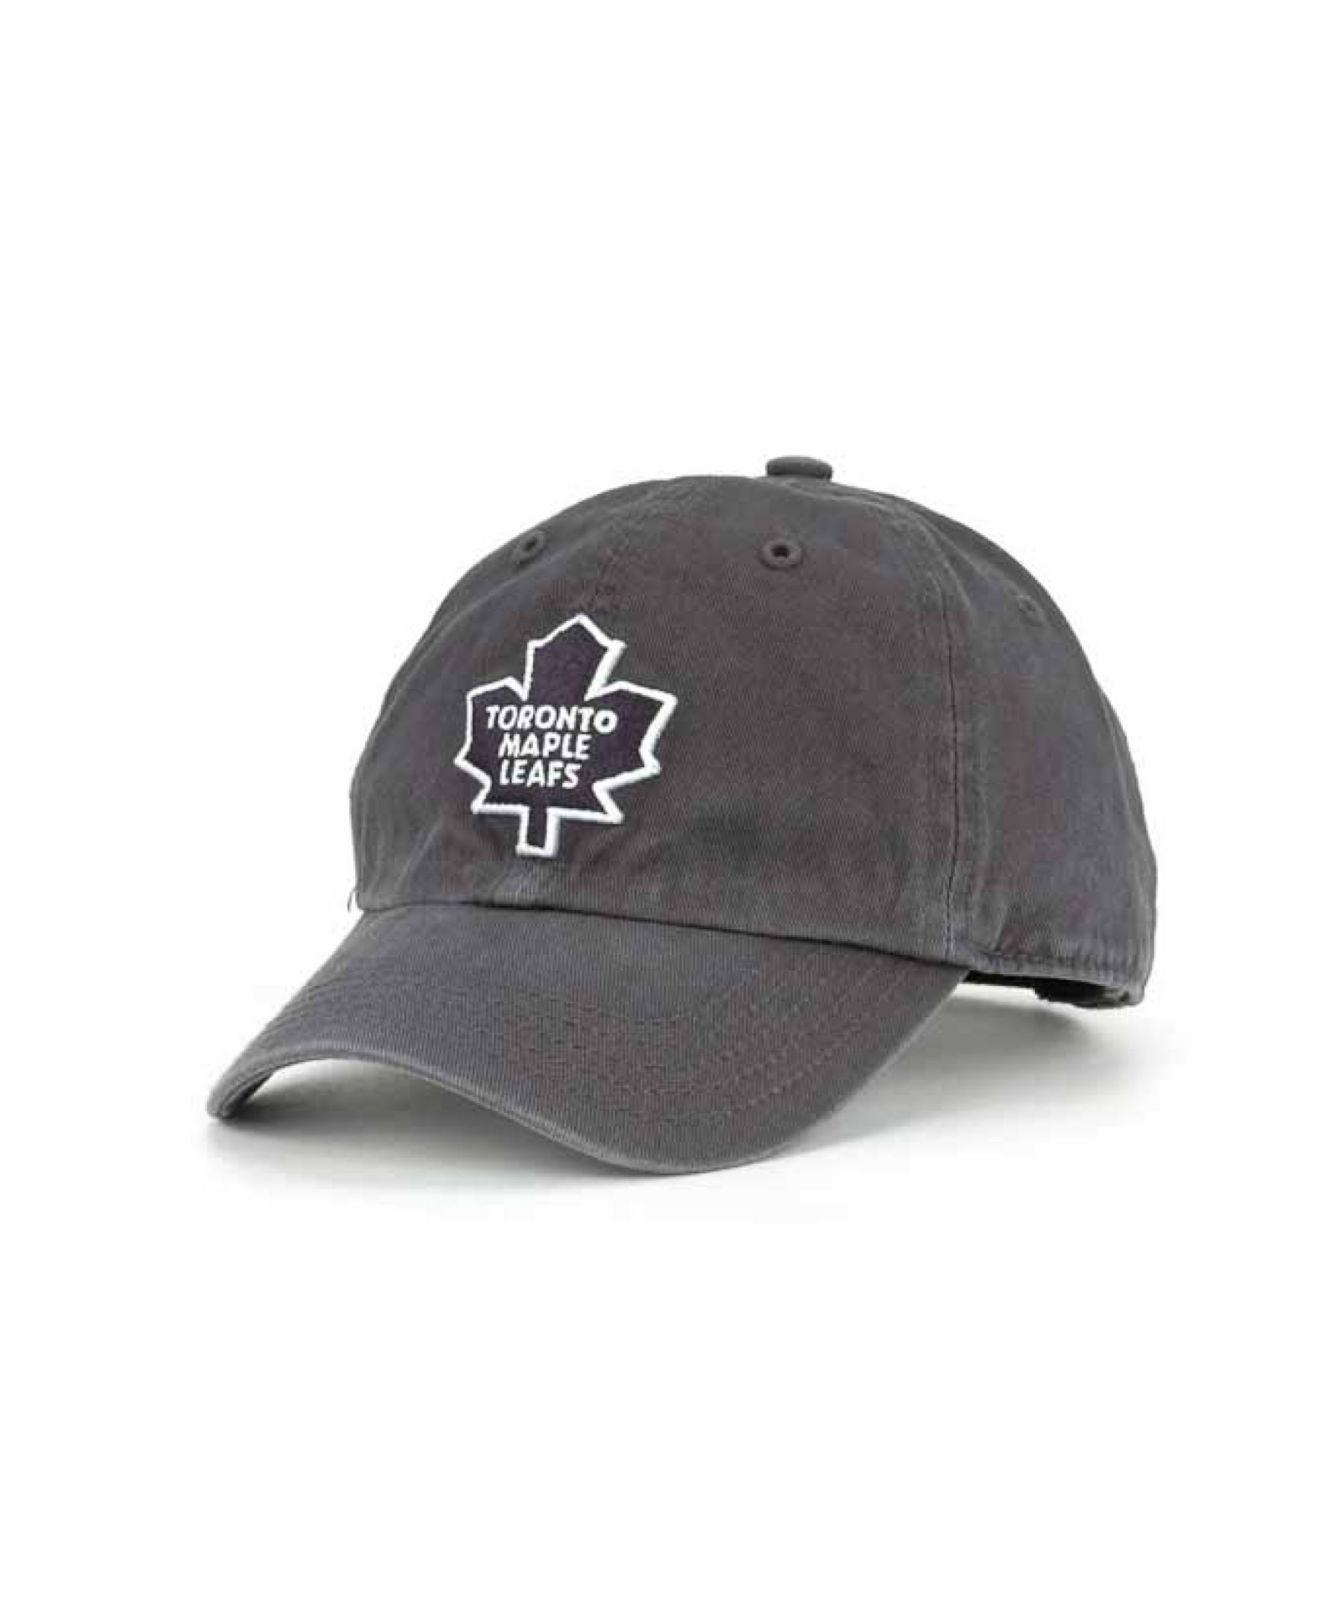 sale retailer 8488b 2de6c ... wholesale lyst 47 brand little kids toronto maple leafs clean up cap in  6c5aa 61161